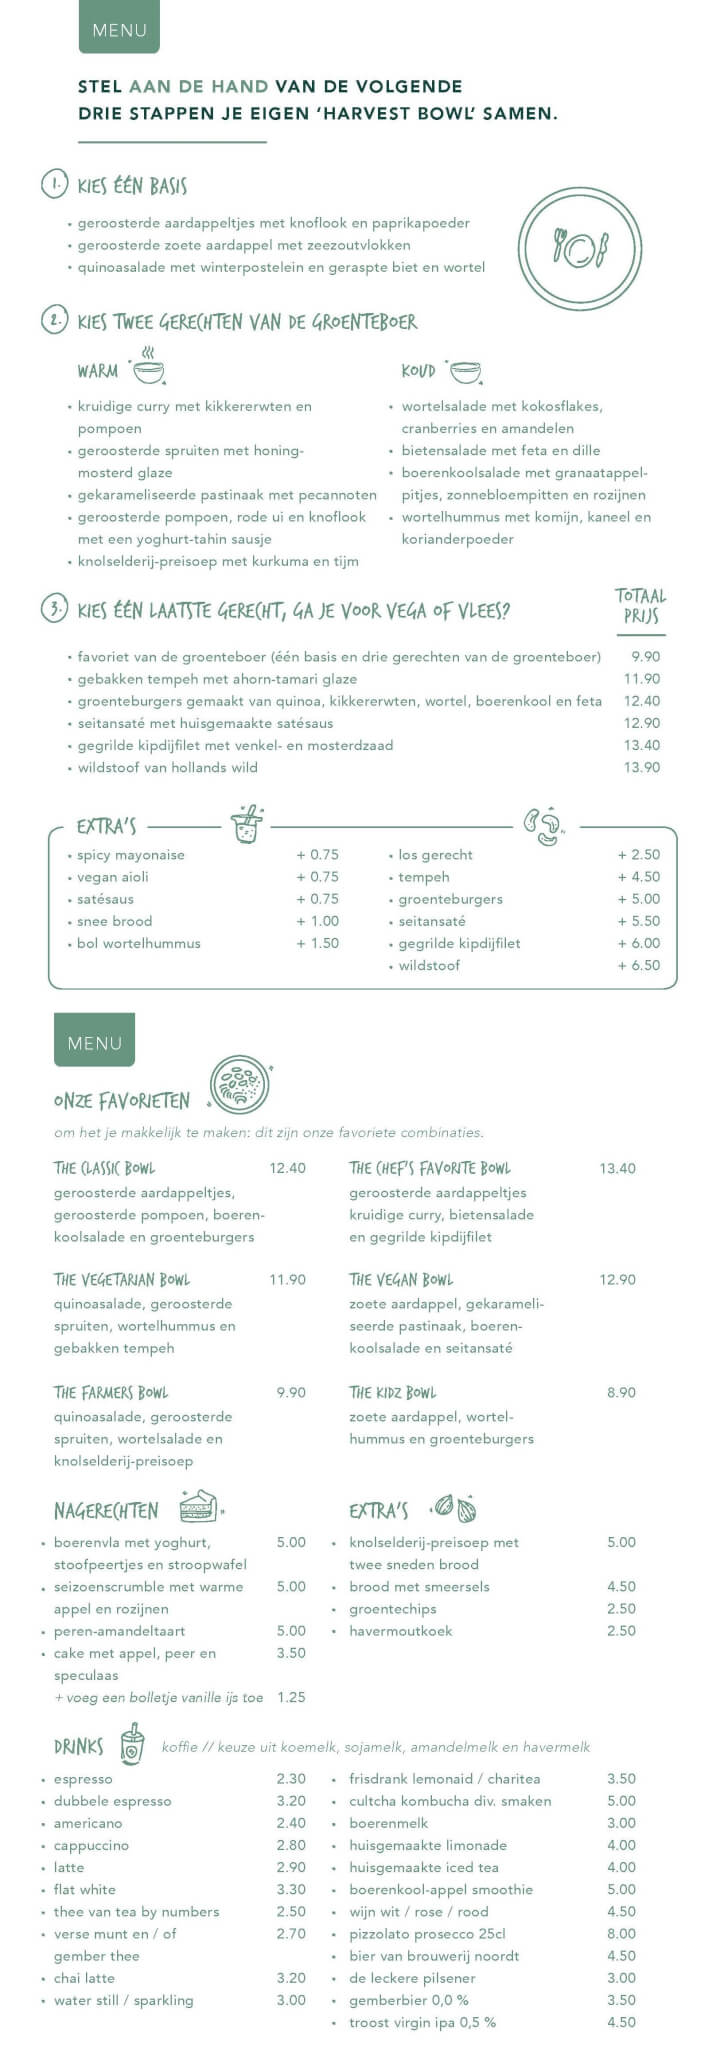 a4_print_nl_menu_winter_2019_2020_the_harvest_pagina_2-mobiel